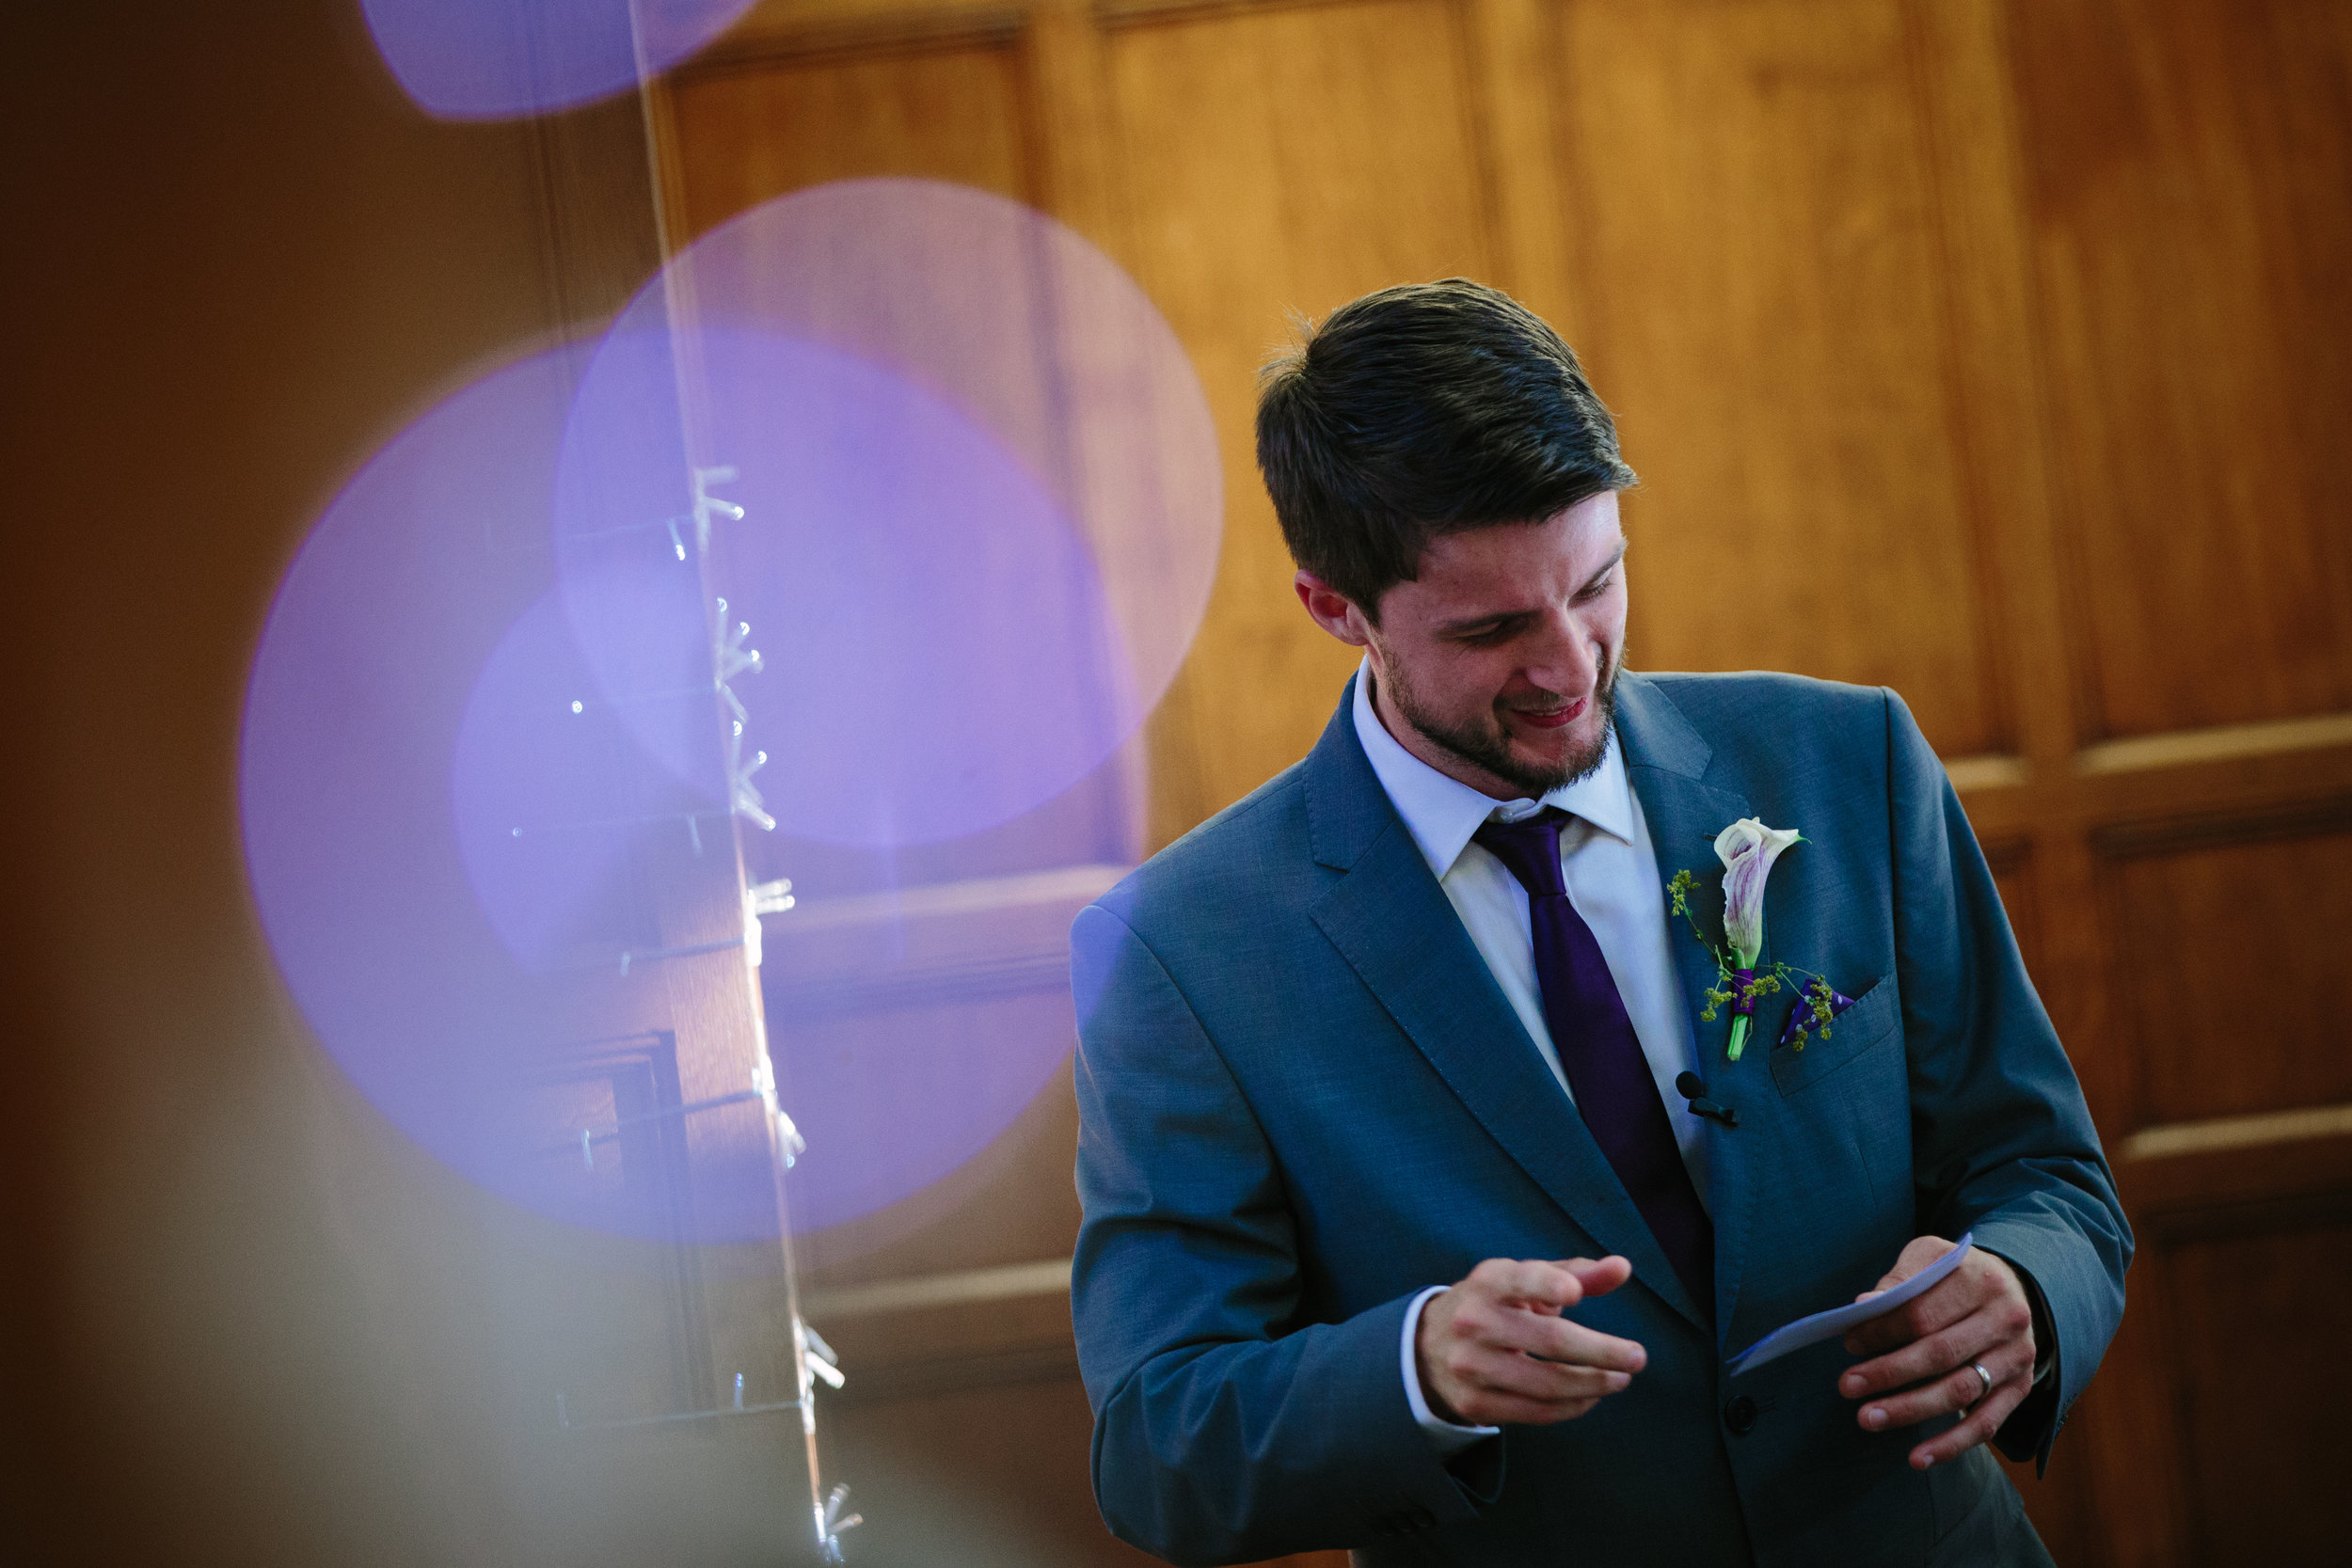 Saint-Alfege-Church-greenwich-wedding-charlton-house-speech-8